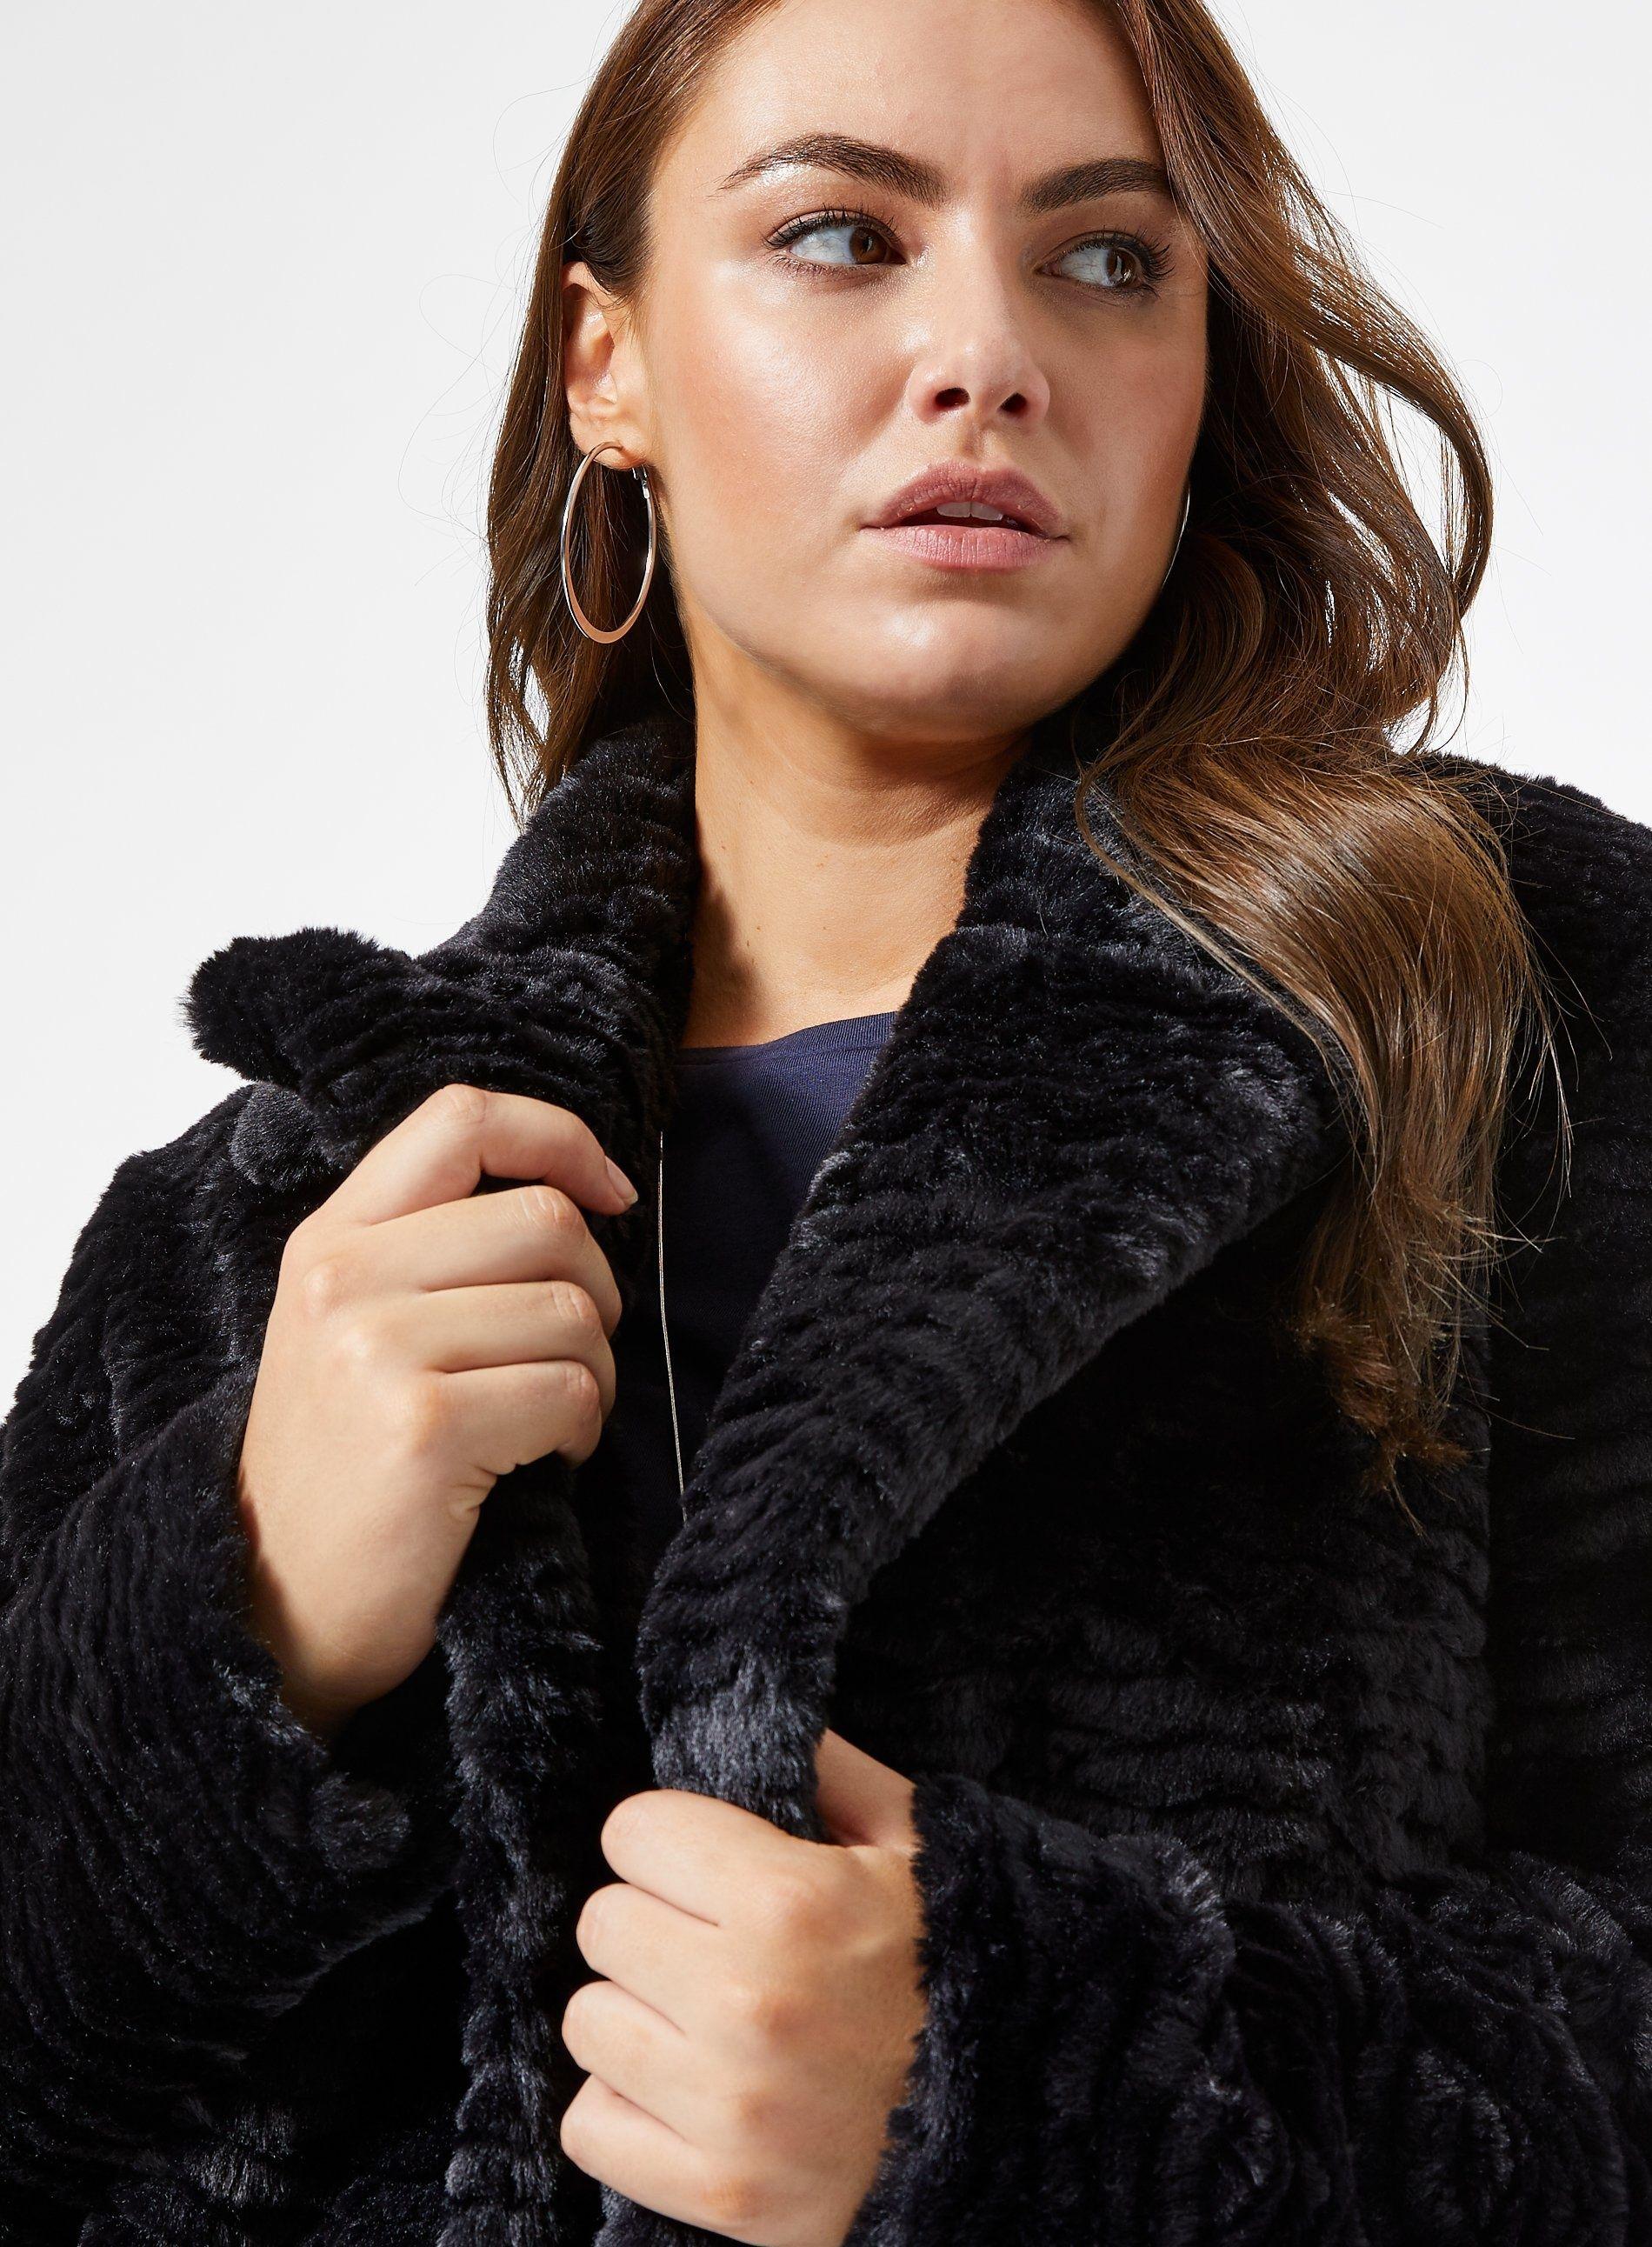 Dorothy Perkins Womens Curve Black Short Faux Fur Coat Jacket Outwear Top